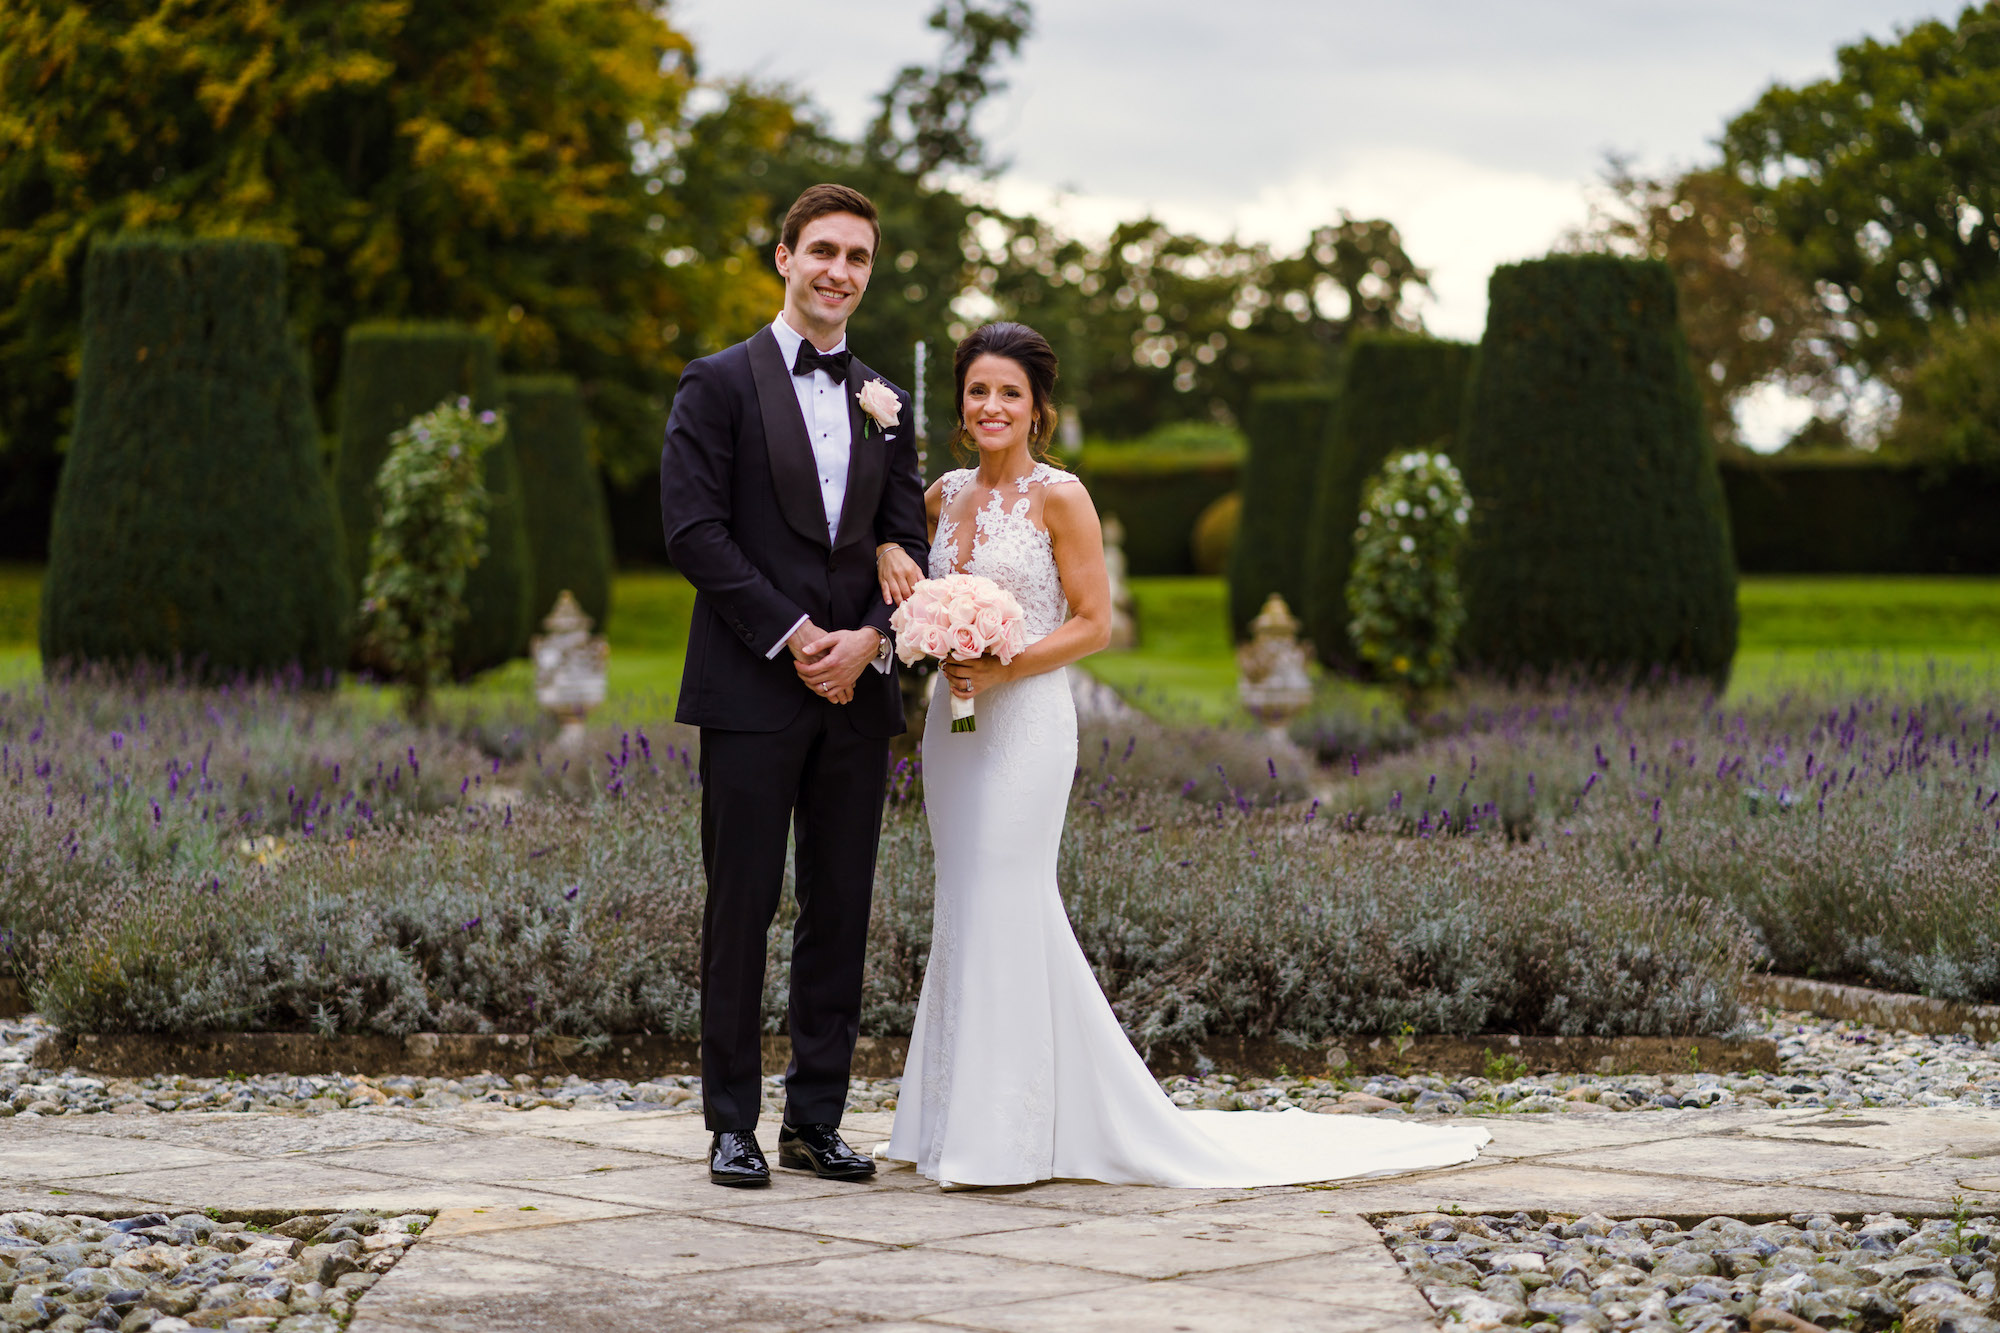 61   Hengrave Hall Wedding   Suffolk Wedding   Lamare London   Luxury Wedding Planner   Jon Mold Photography.jpg